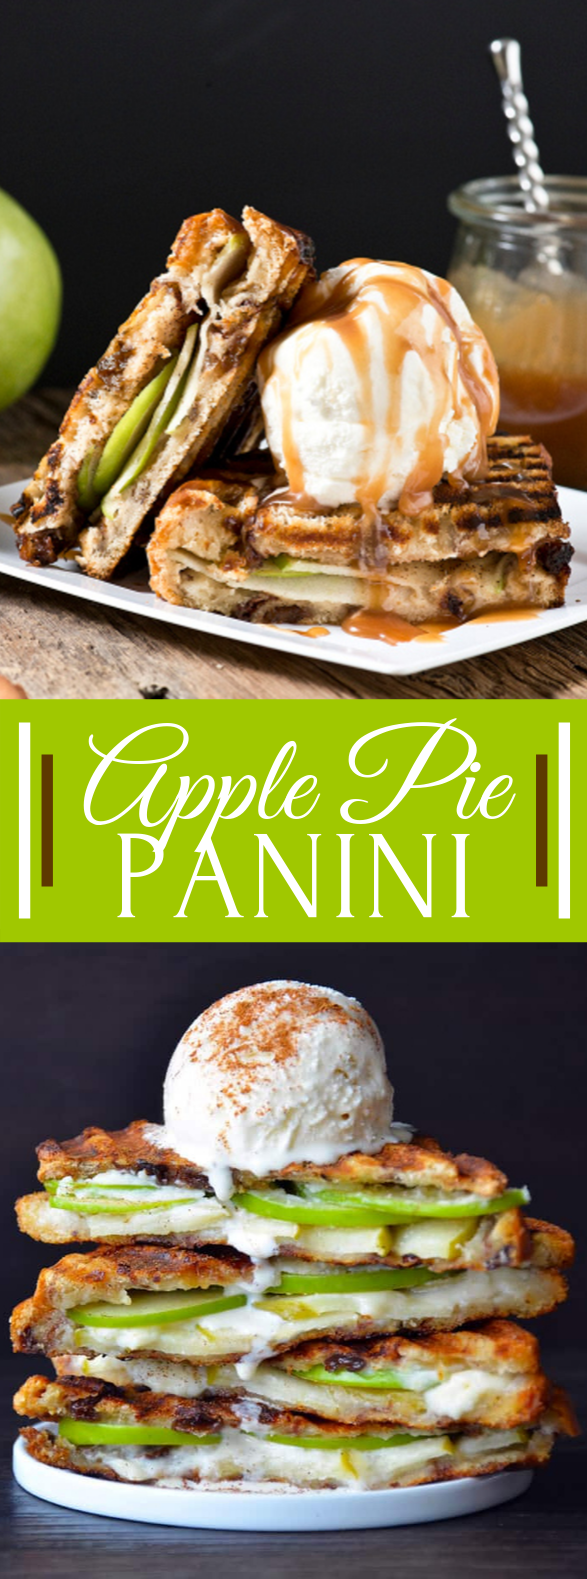 Apple Pie Panini #desserts #caramel